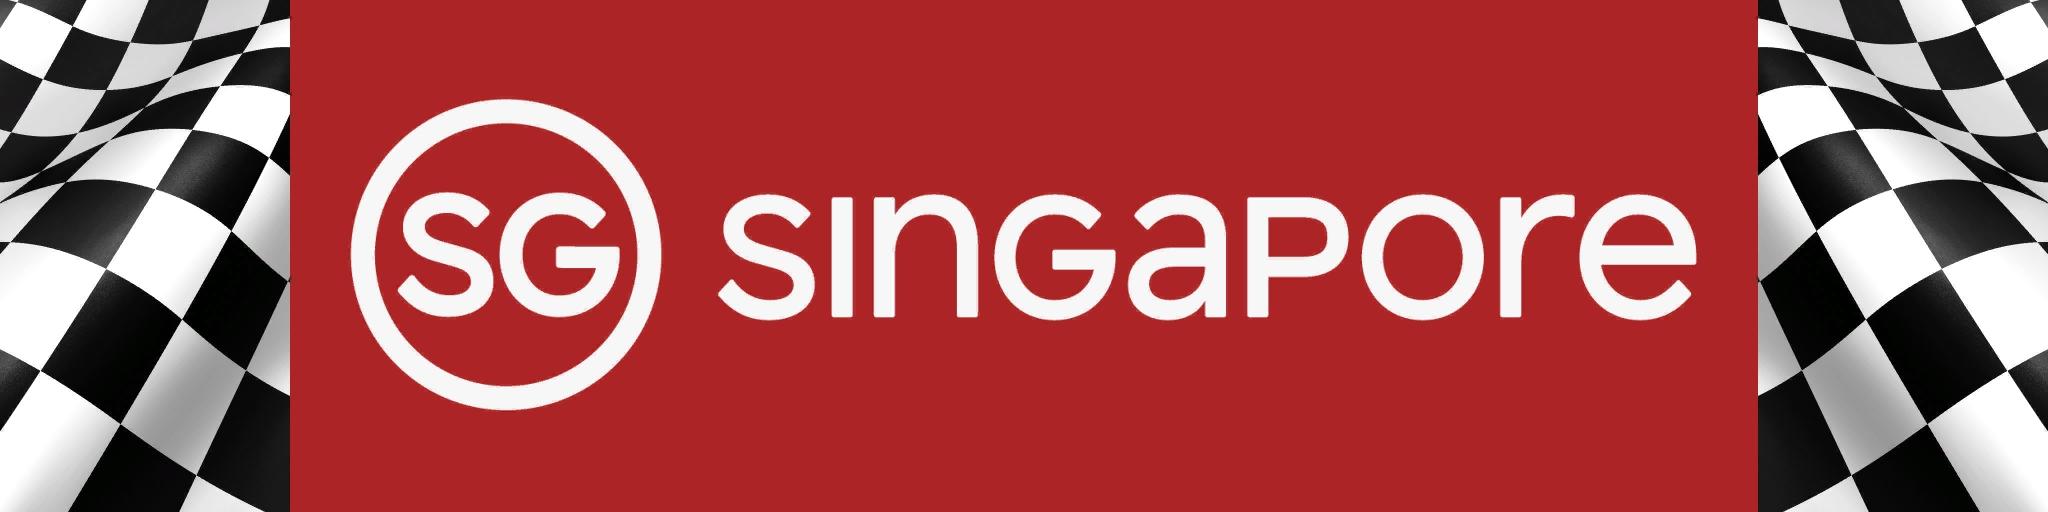 2017_singapore_board_a.jpg